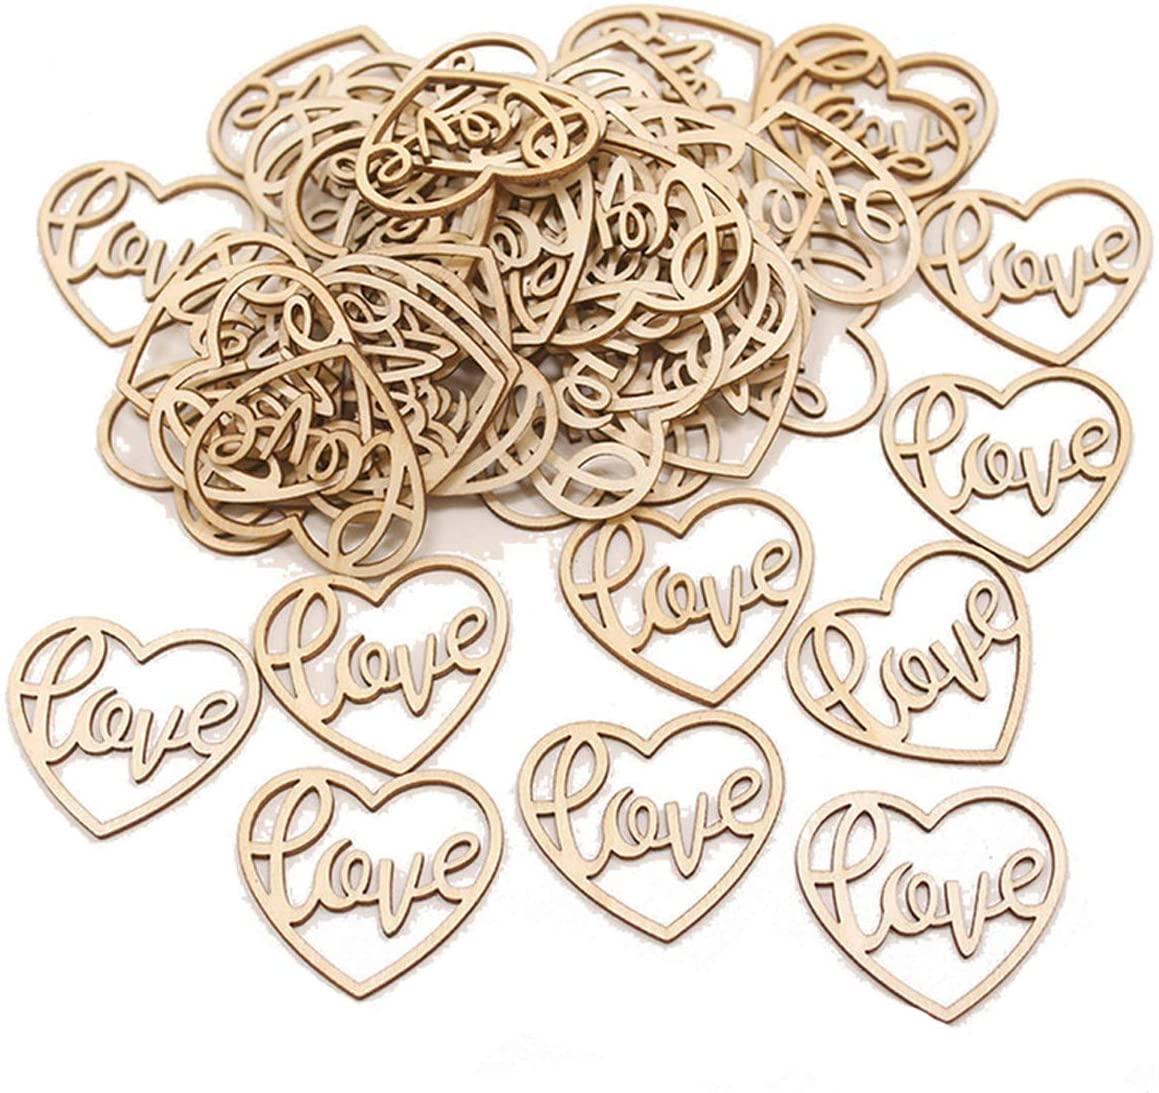 50PCS Wood Hearts Slices Wooden Discs Heart Shaped Embellishment for Wedding Decor Arts Crafts DIY Photo Album Decoration